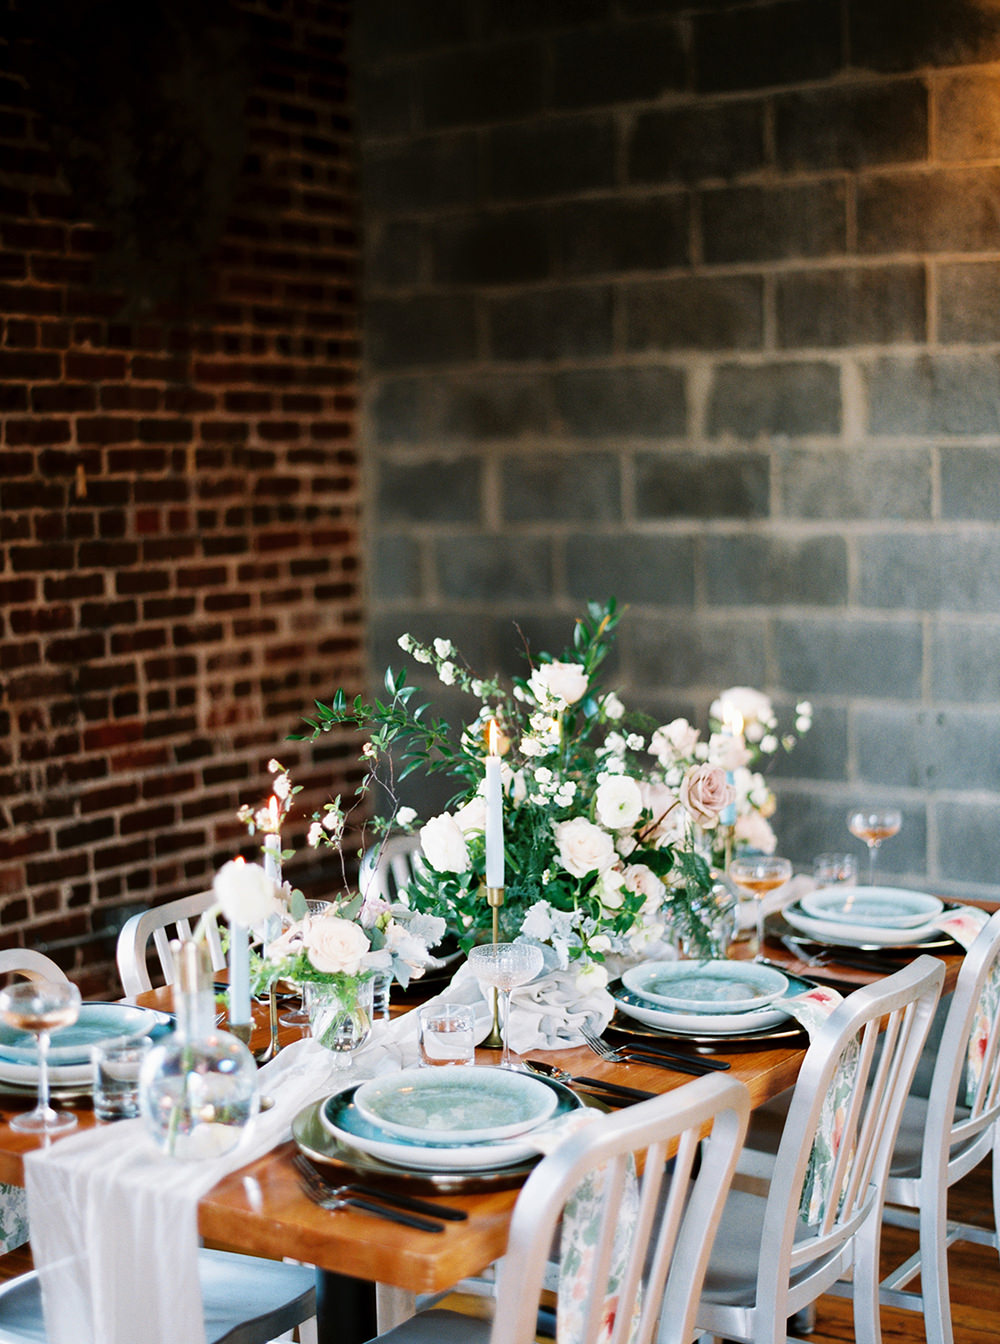 wedding reception tables - photo by Photos by Heart http://ruffledblog.com/downtown-birmingham-spring-wedding-inspiration